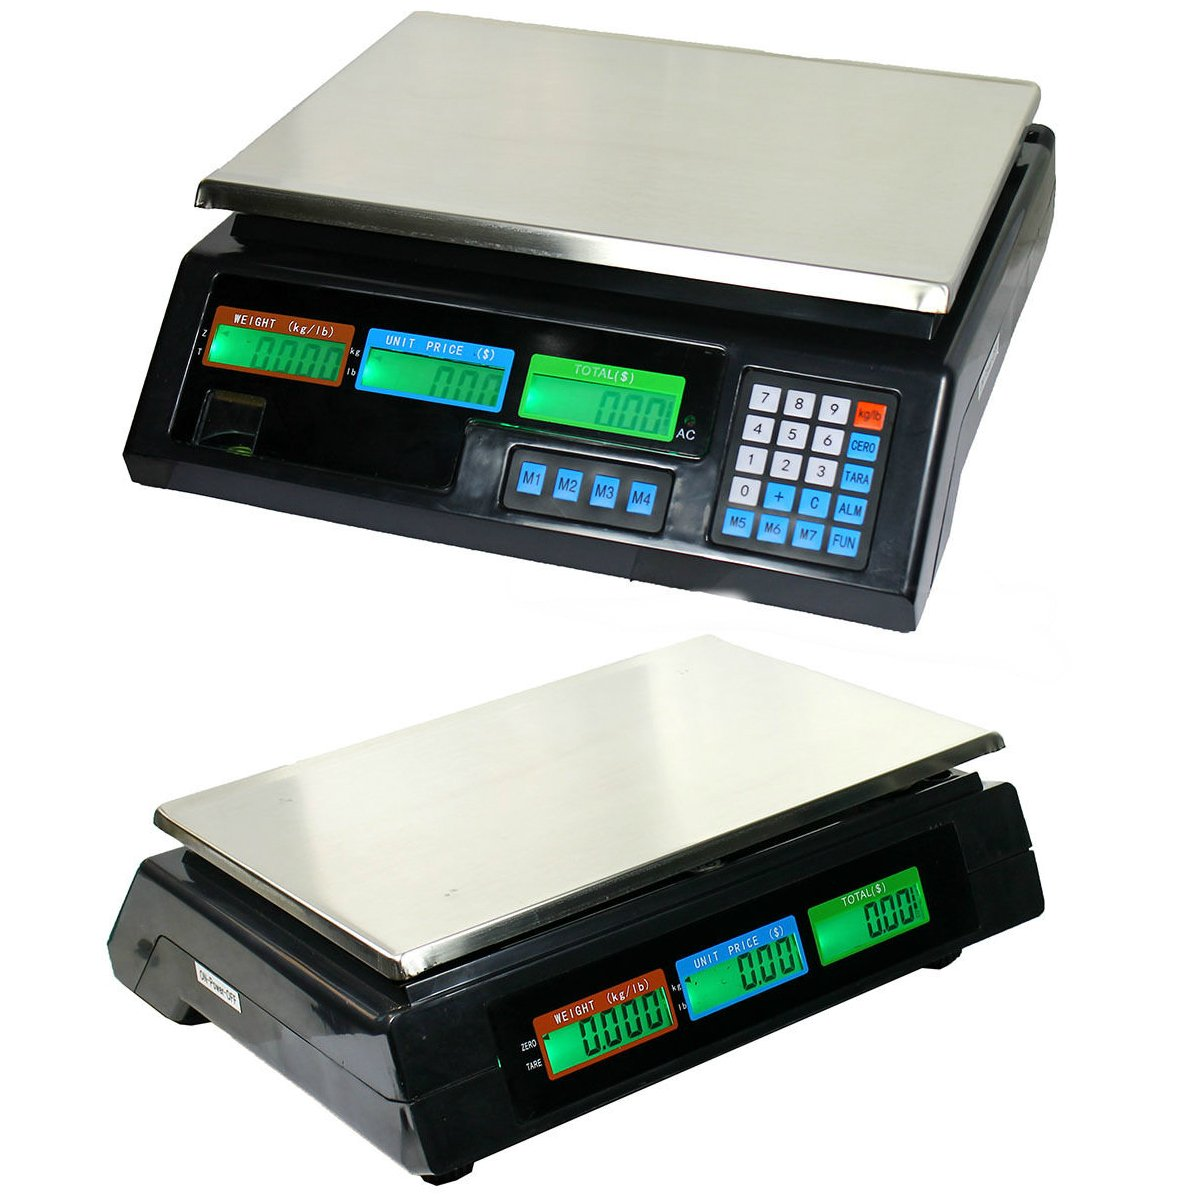 88lbs/40kg Digital Deli Scale | Food Meat Price Computing Digital Weight Scale New